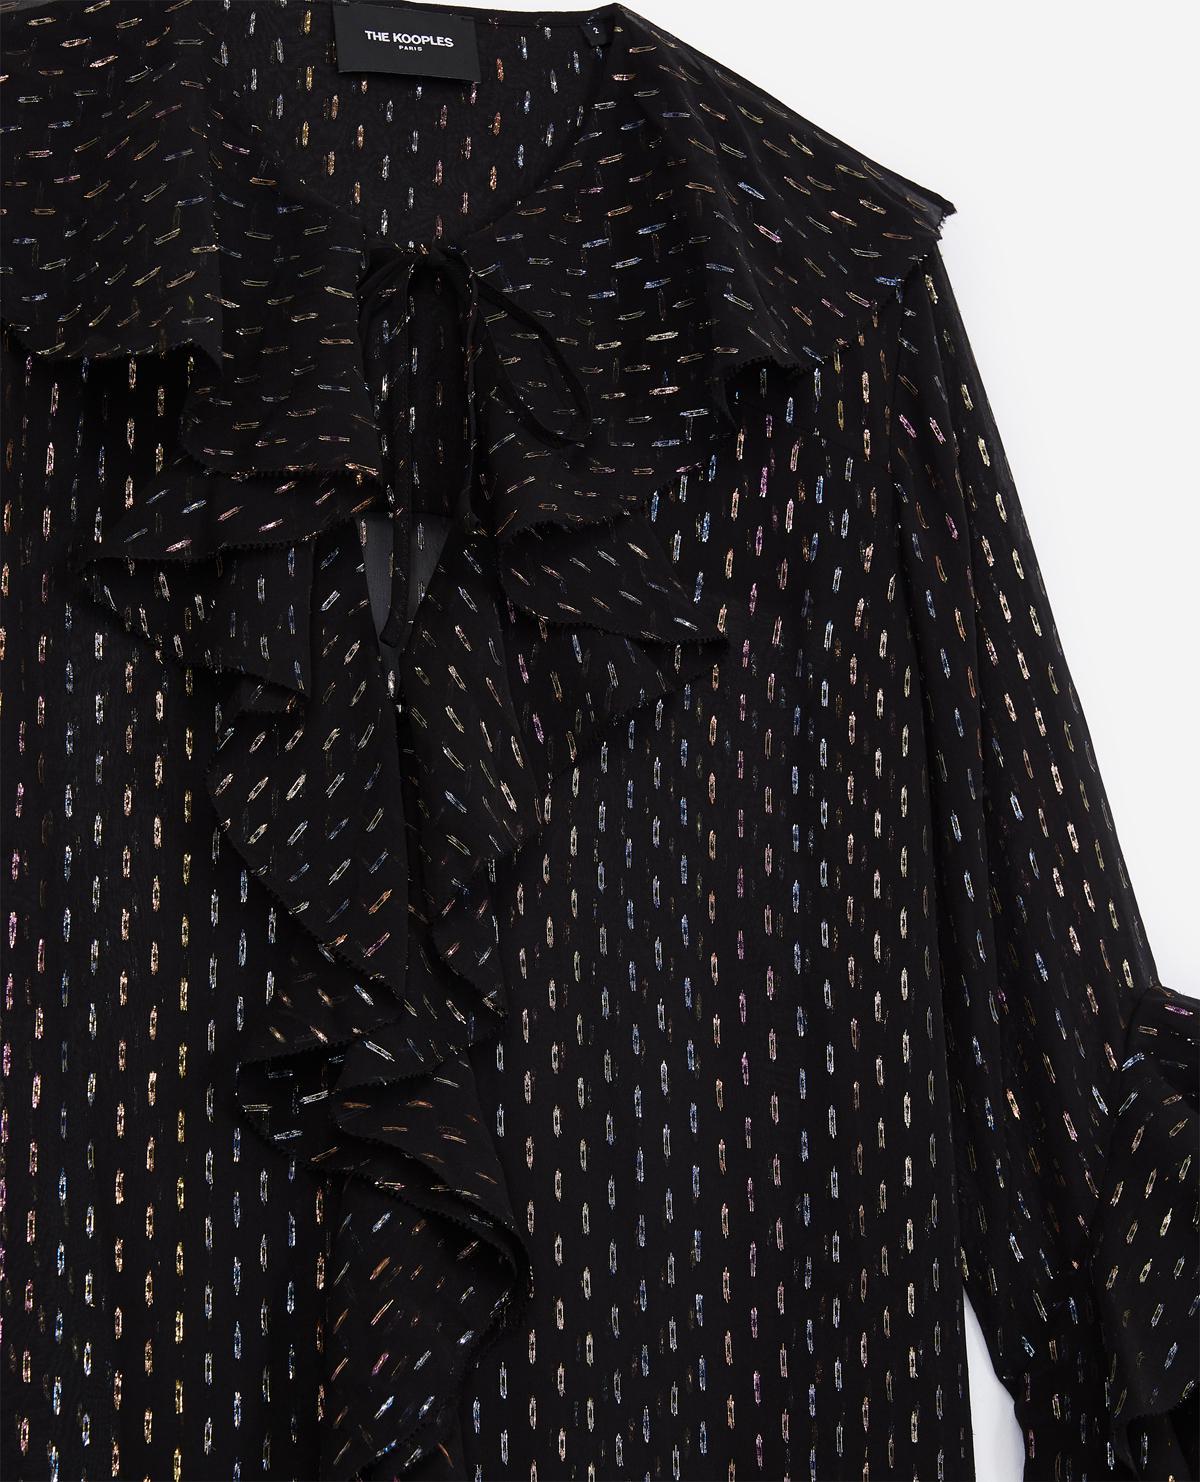 f1dbeedf02b14 Lyst - The Kooples Black Lurex And Silk Shirt in Black